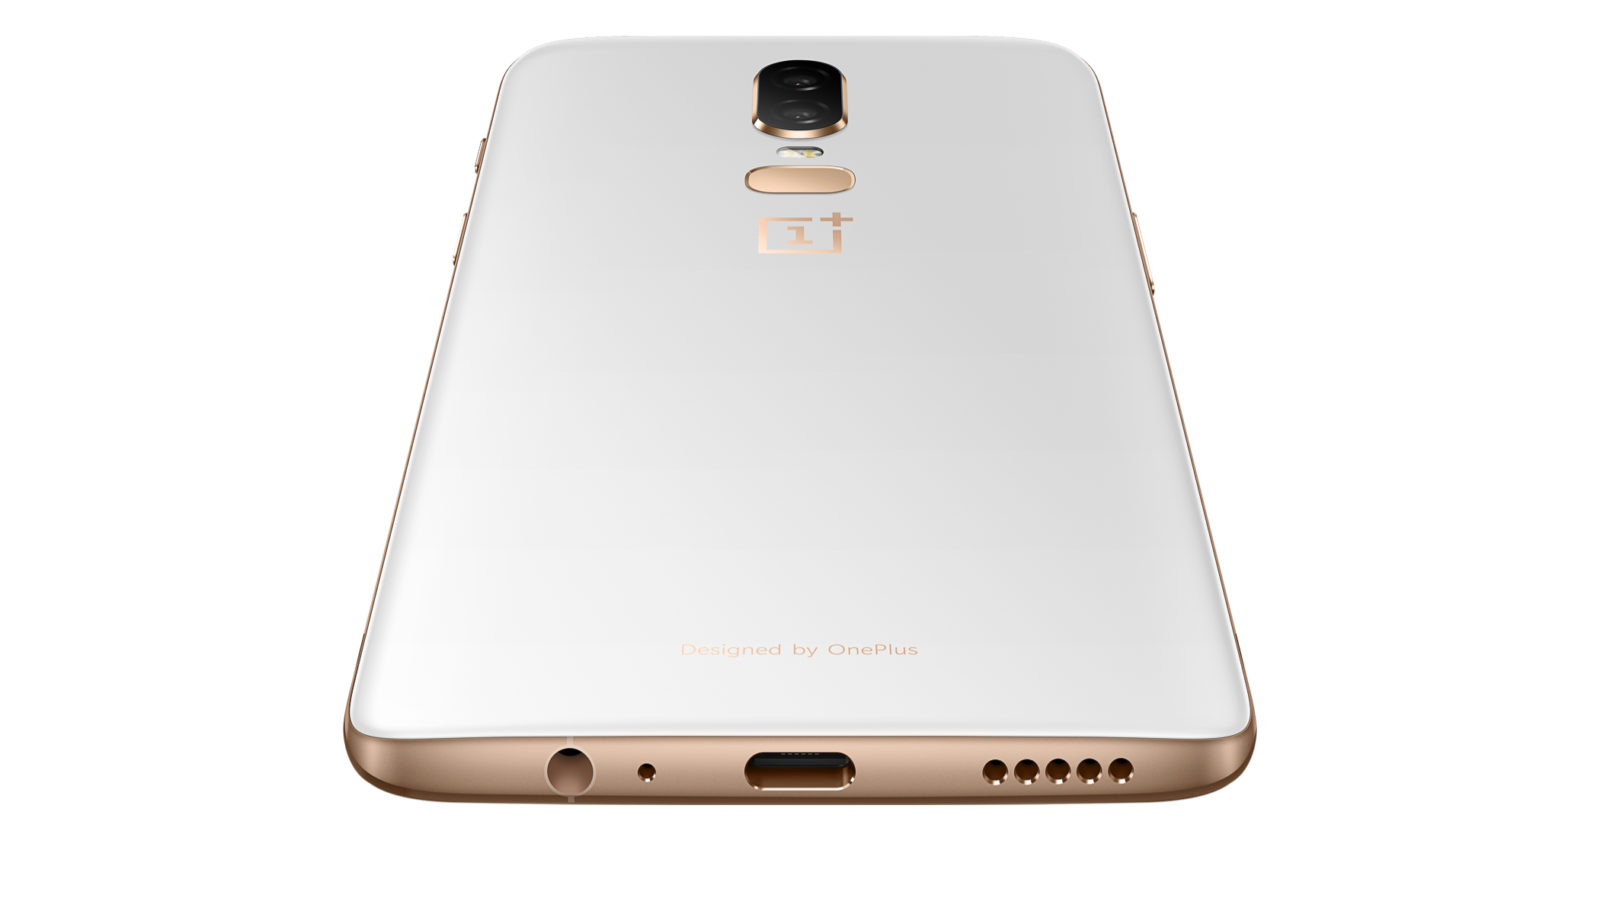 OnePlus-6-Silk-White-05-1600x914.jpg